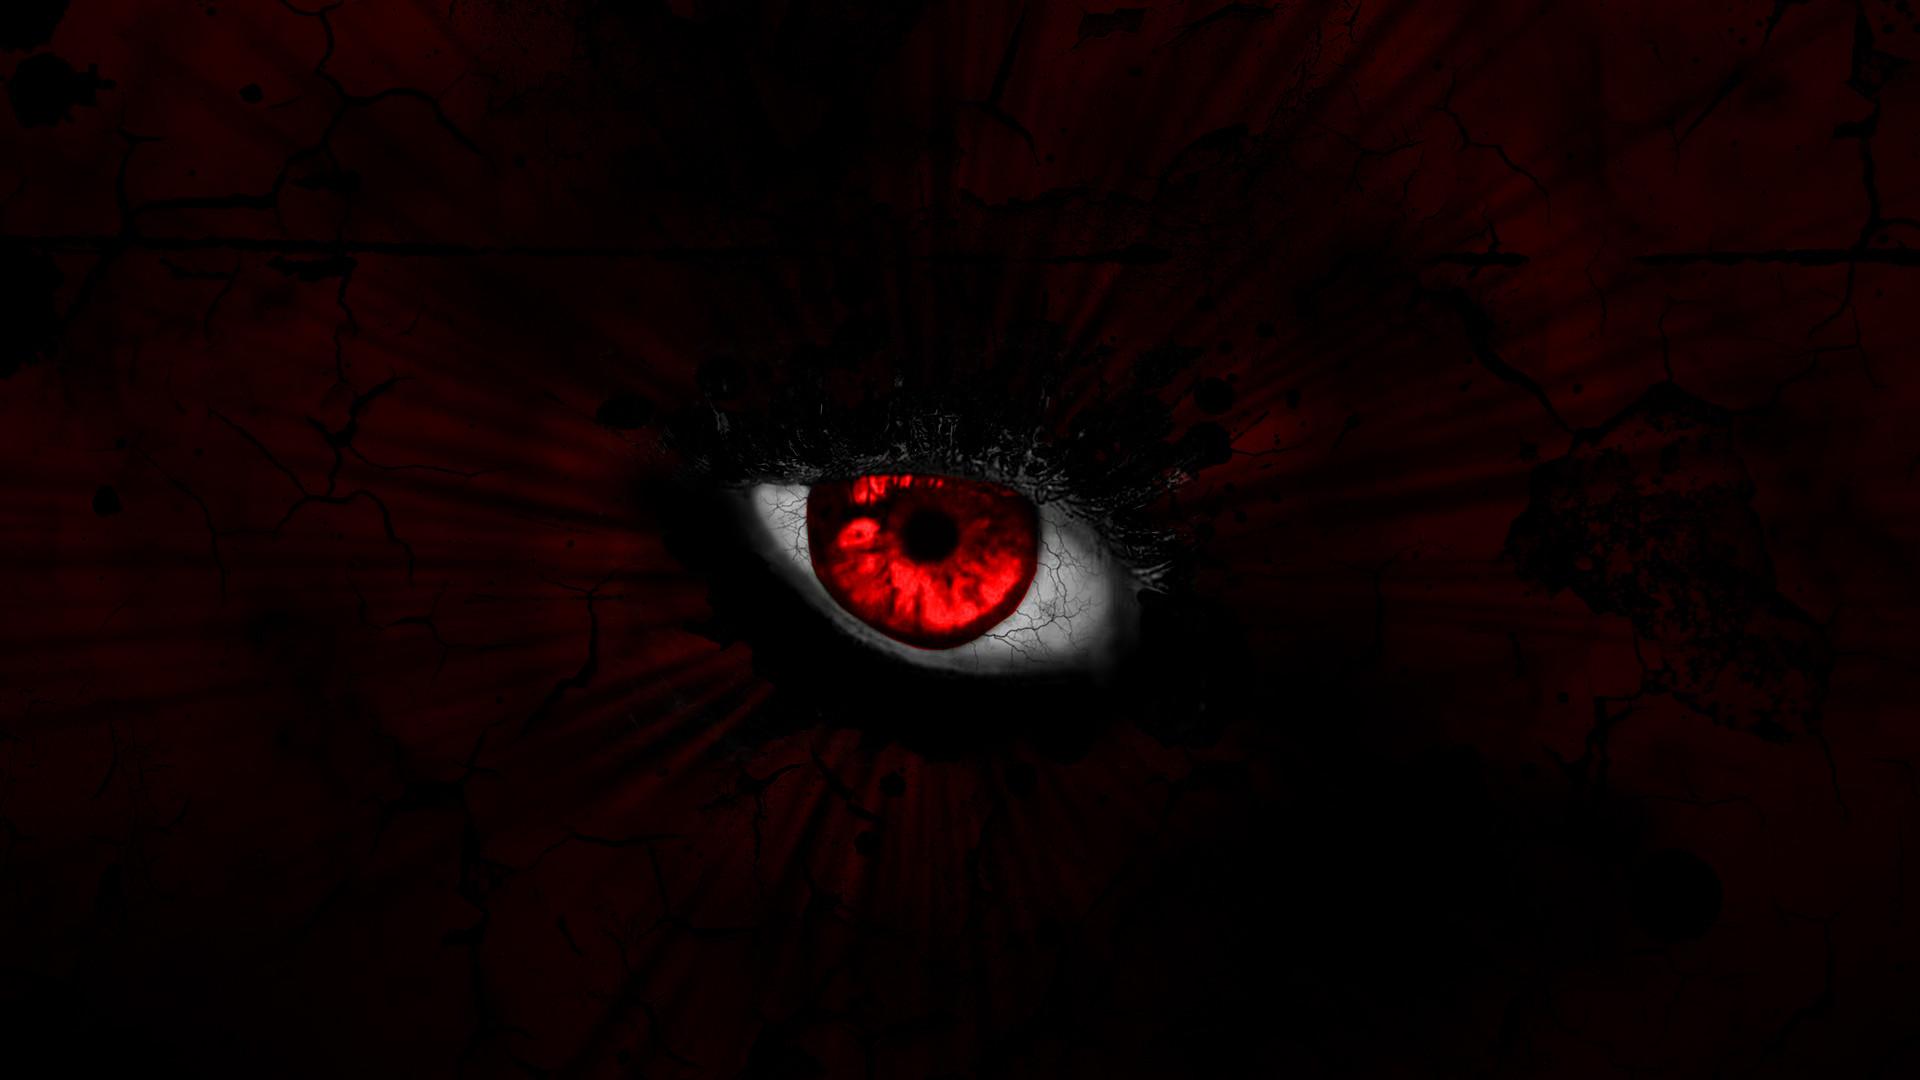 BLACK RED WALLPAPER HD STA006 – wallpaperjosh